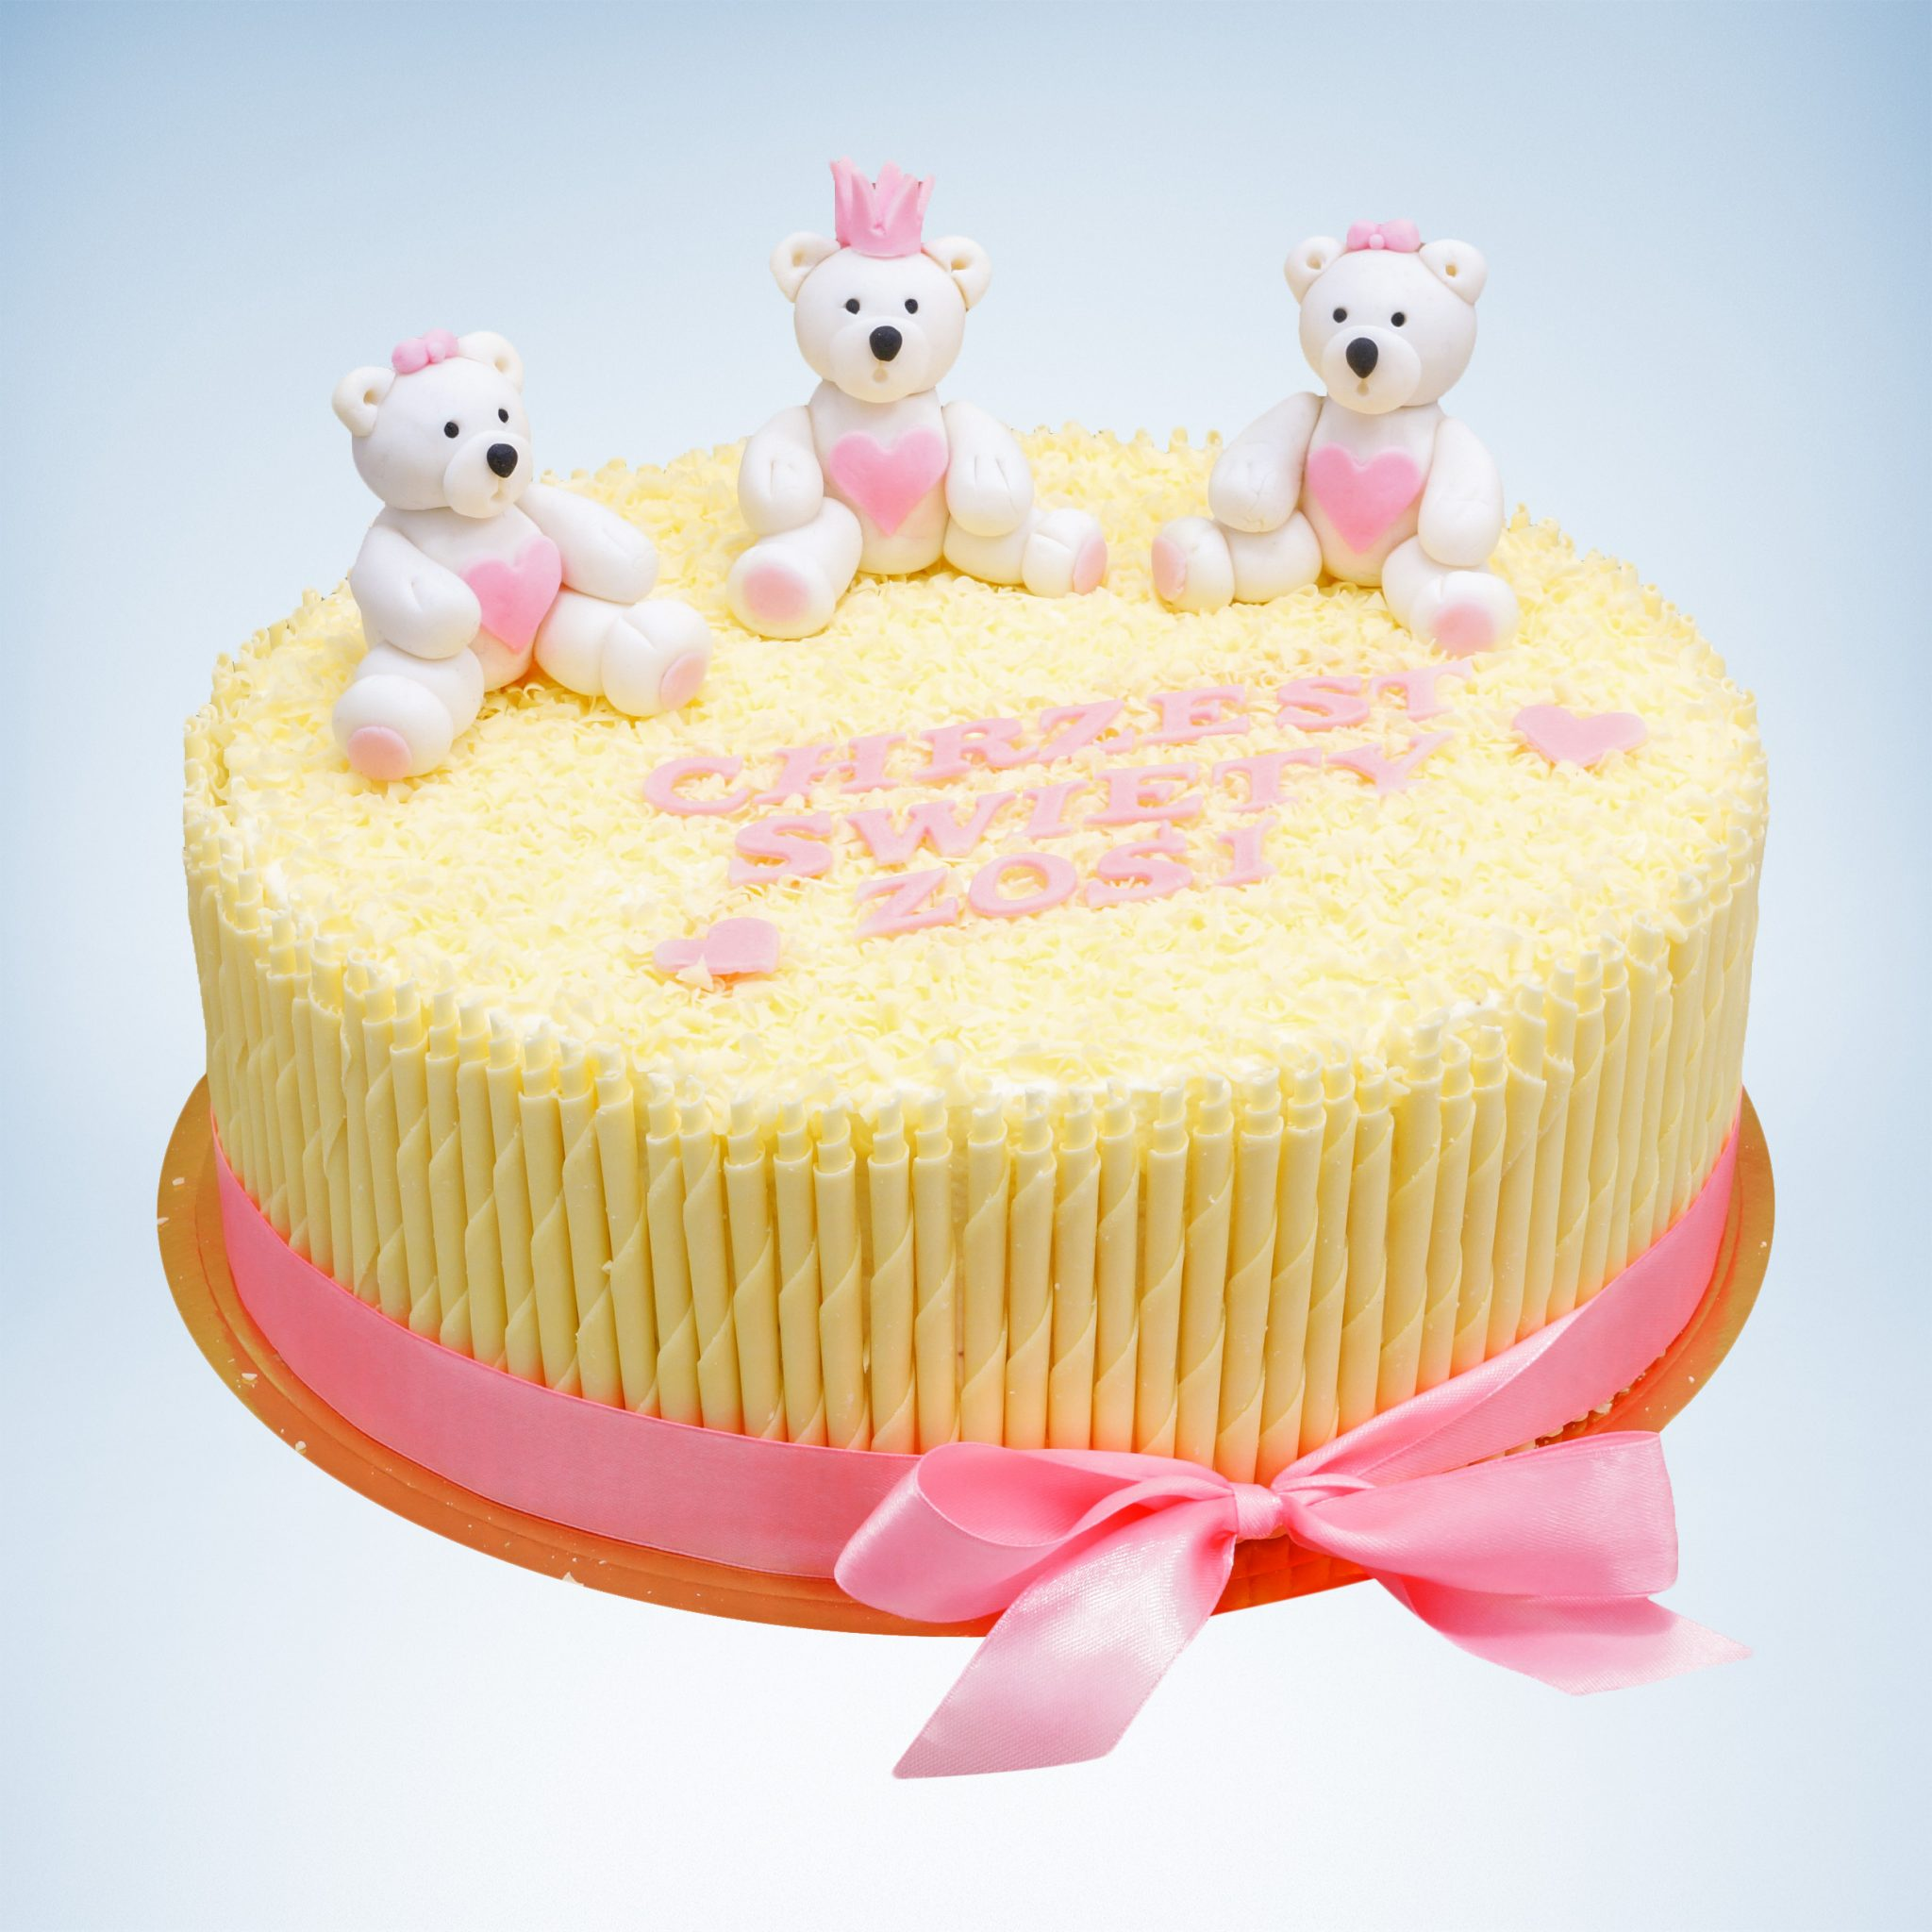 chrzest Święty Tort, tort na chrzciny